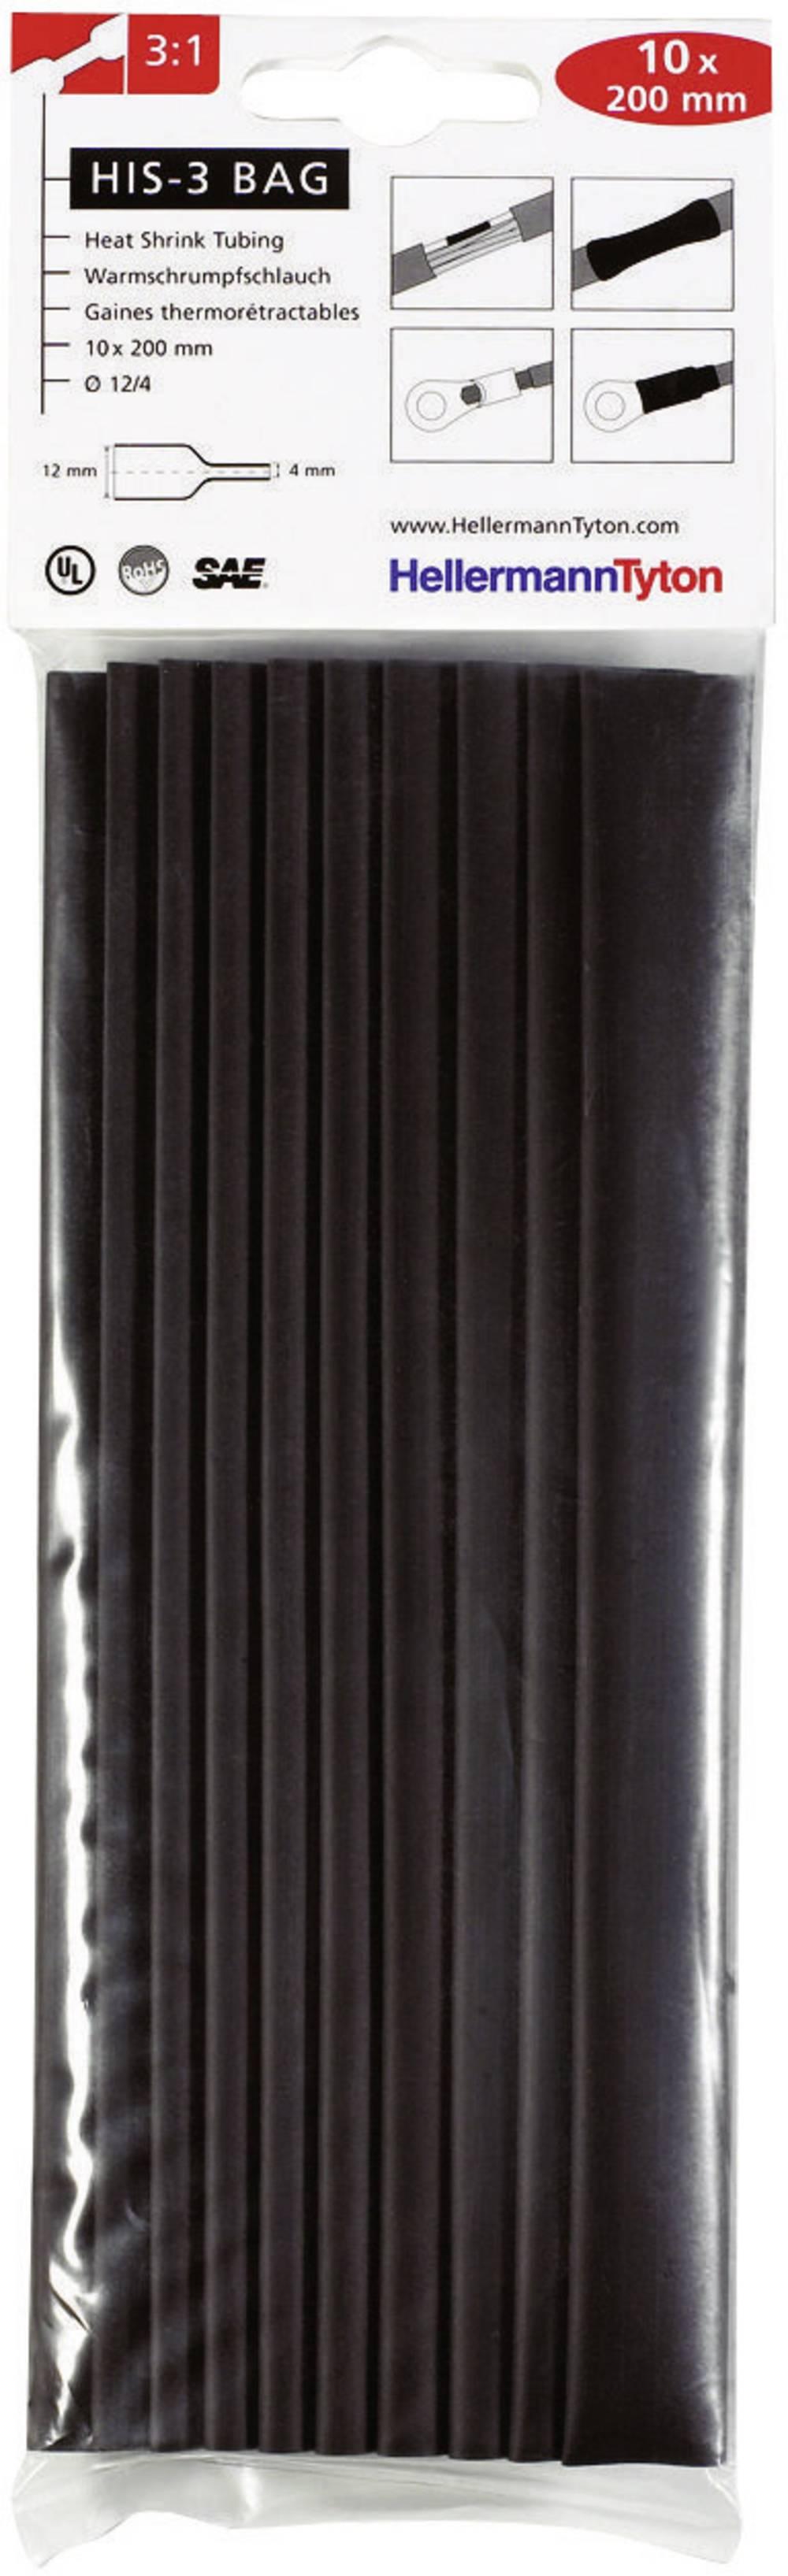 Set termo skupljajućih cijevi(10x 20 cm), HIS-3 3:1, crna,HellermannTyton 308-31210